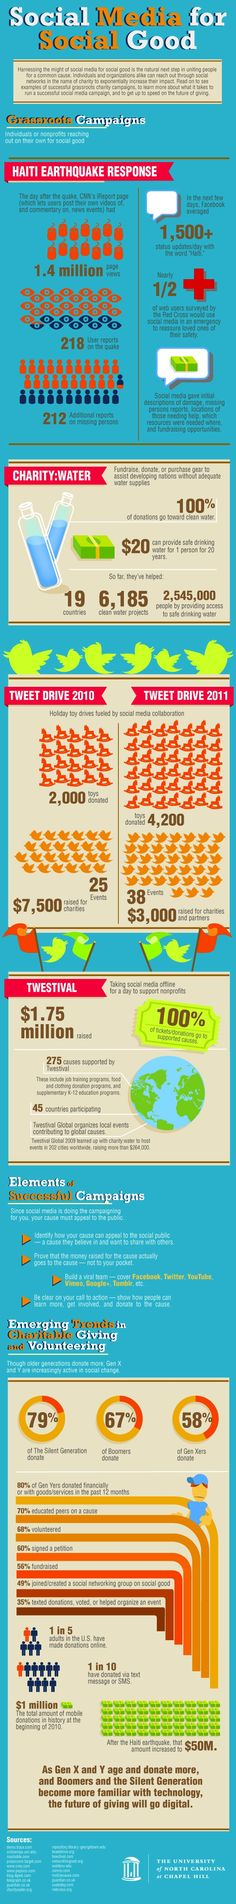 Social Media para el Bien Social #Infografía